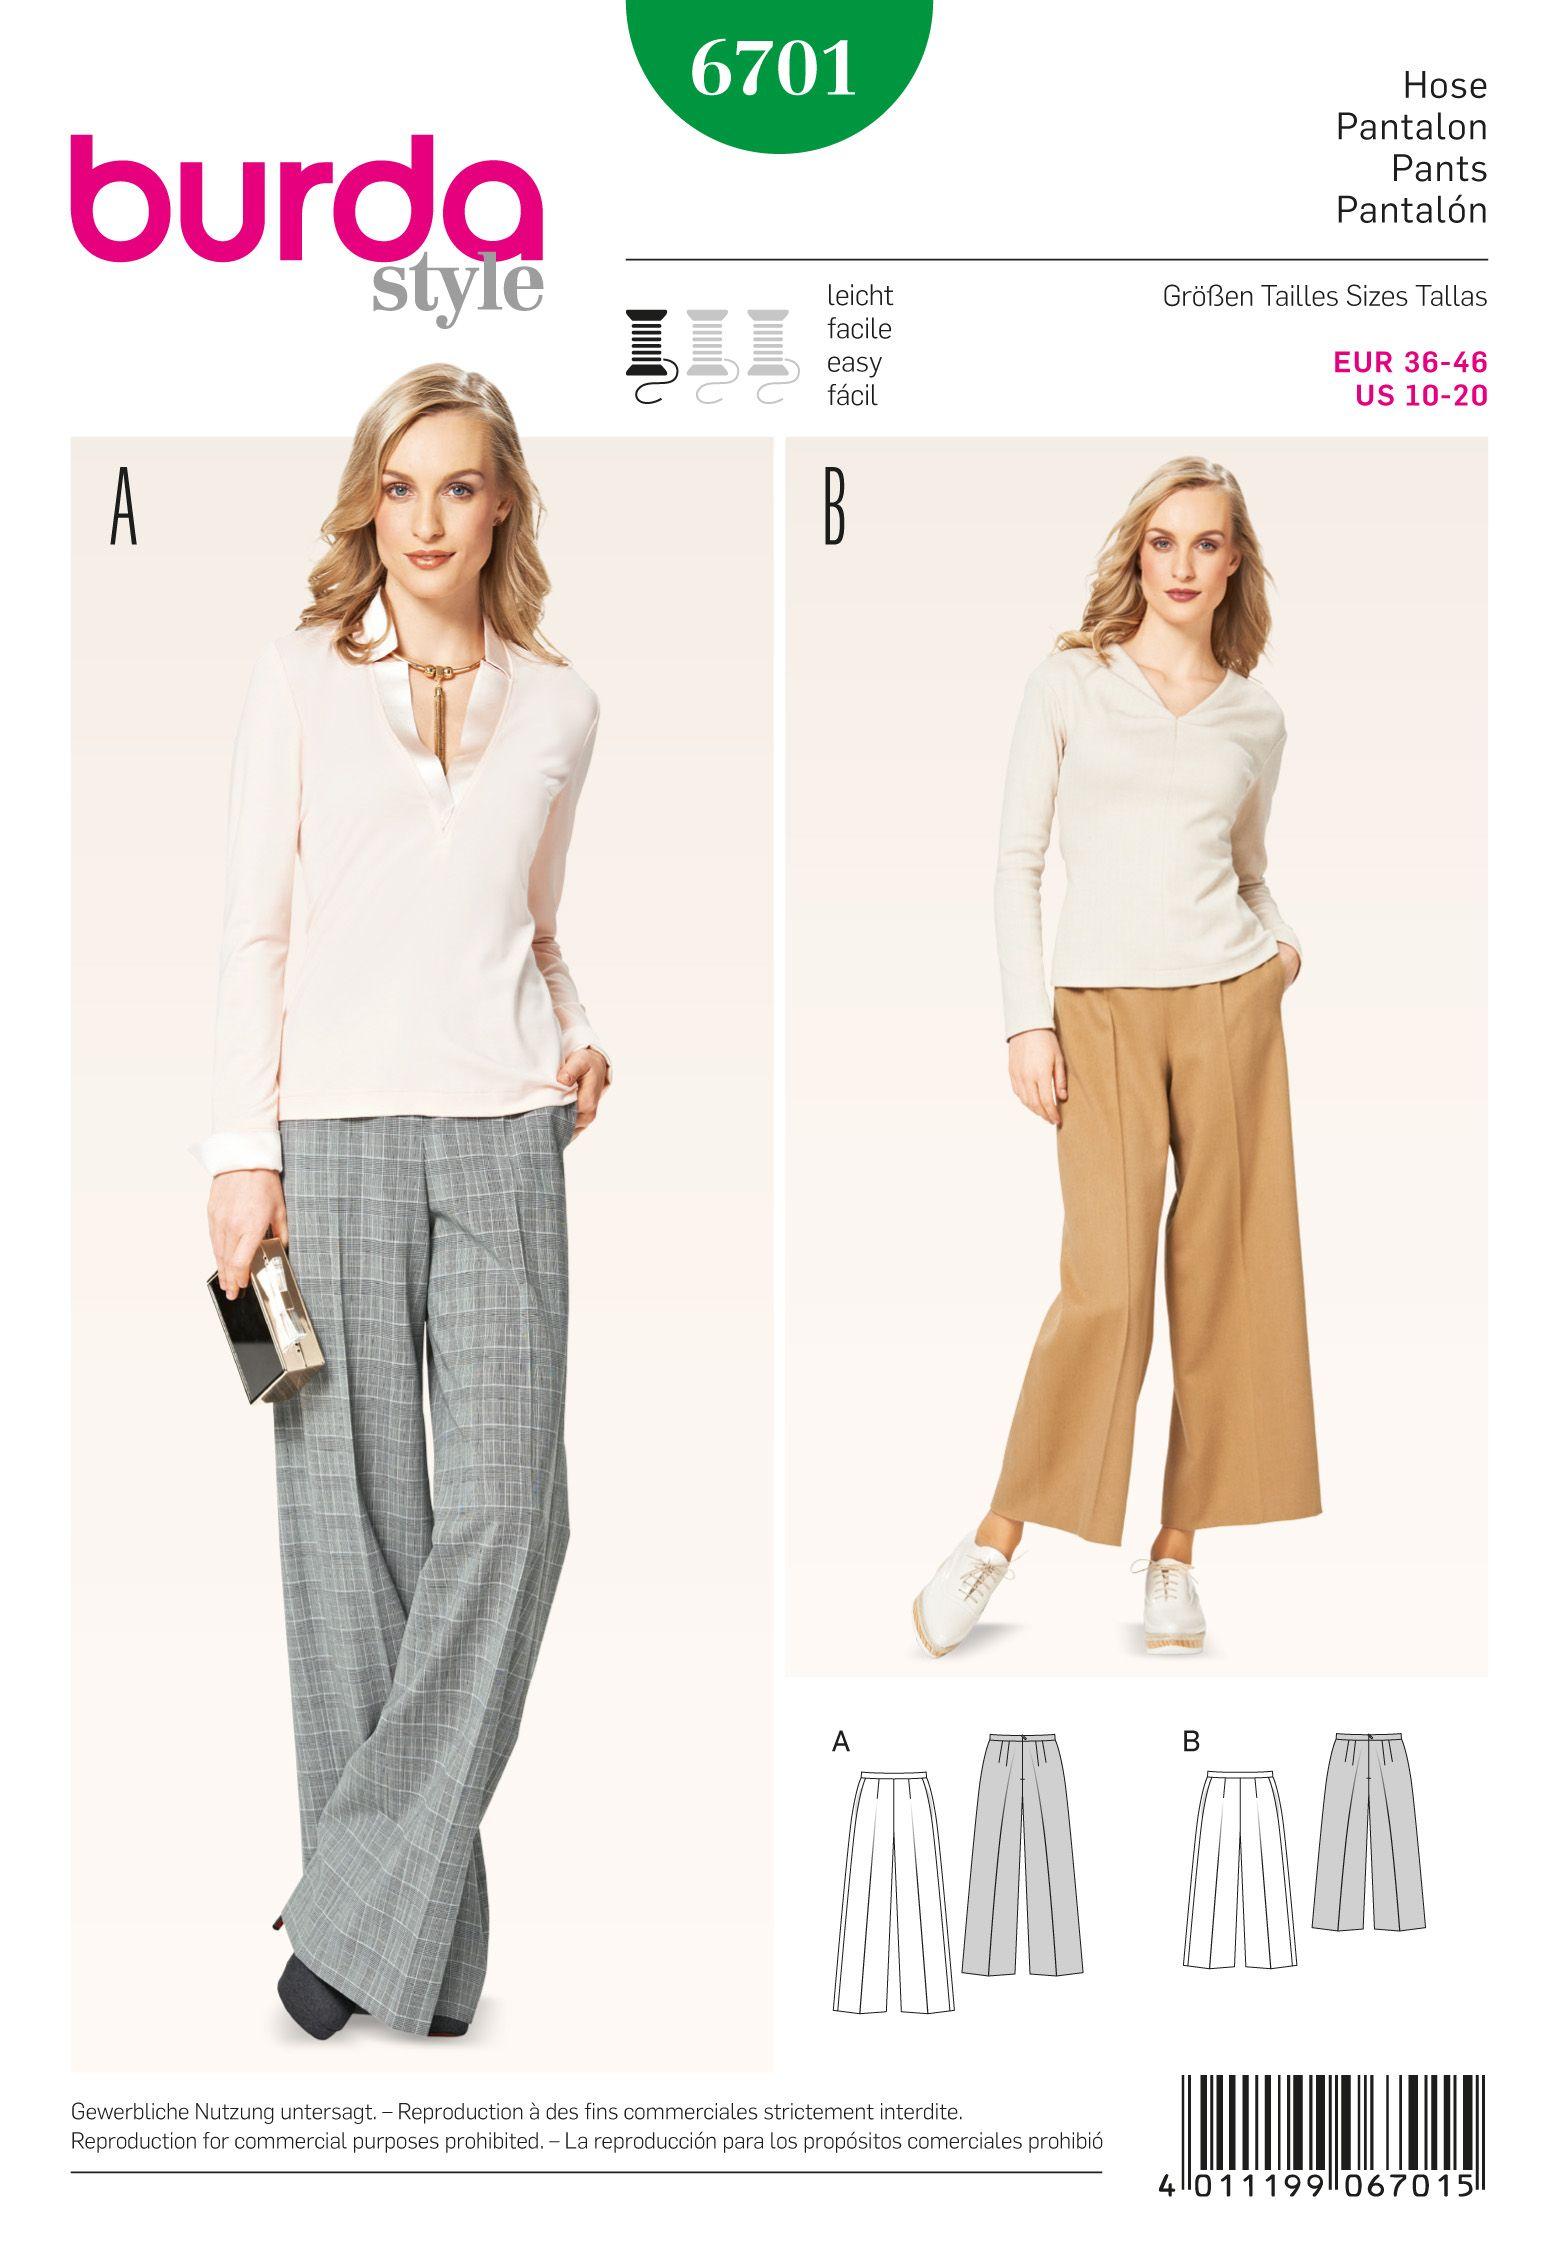 Burda Misses\' Pants 6701 | Pants (My Sewing Pattern Library ...